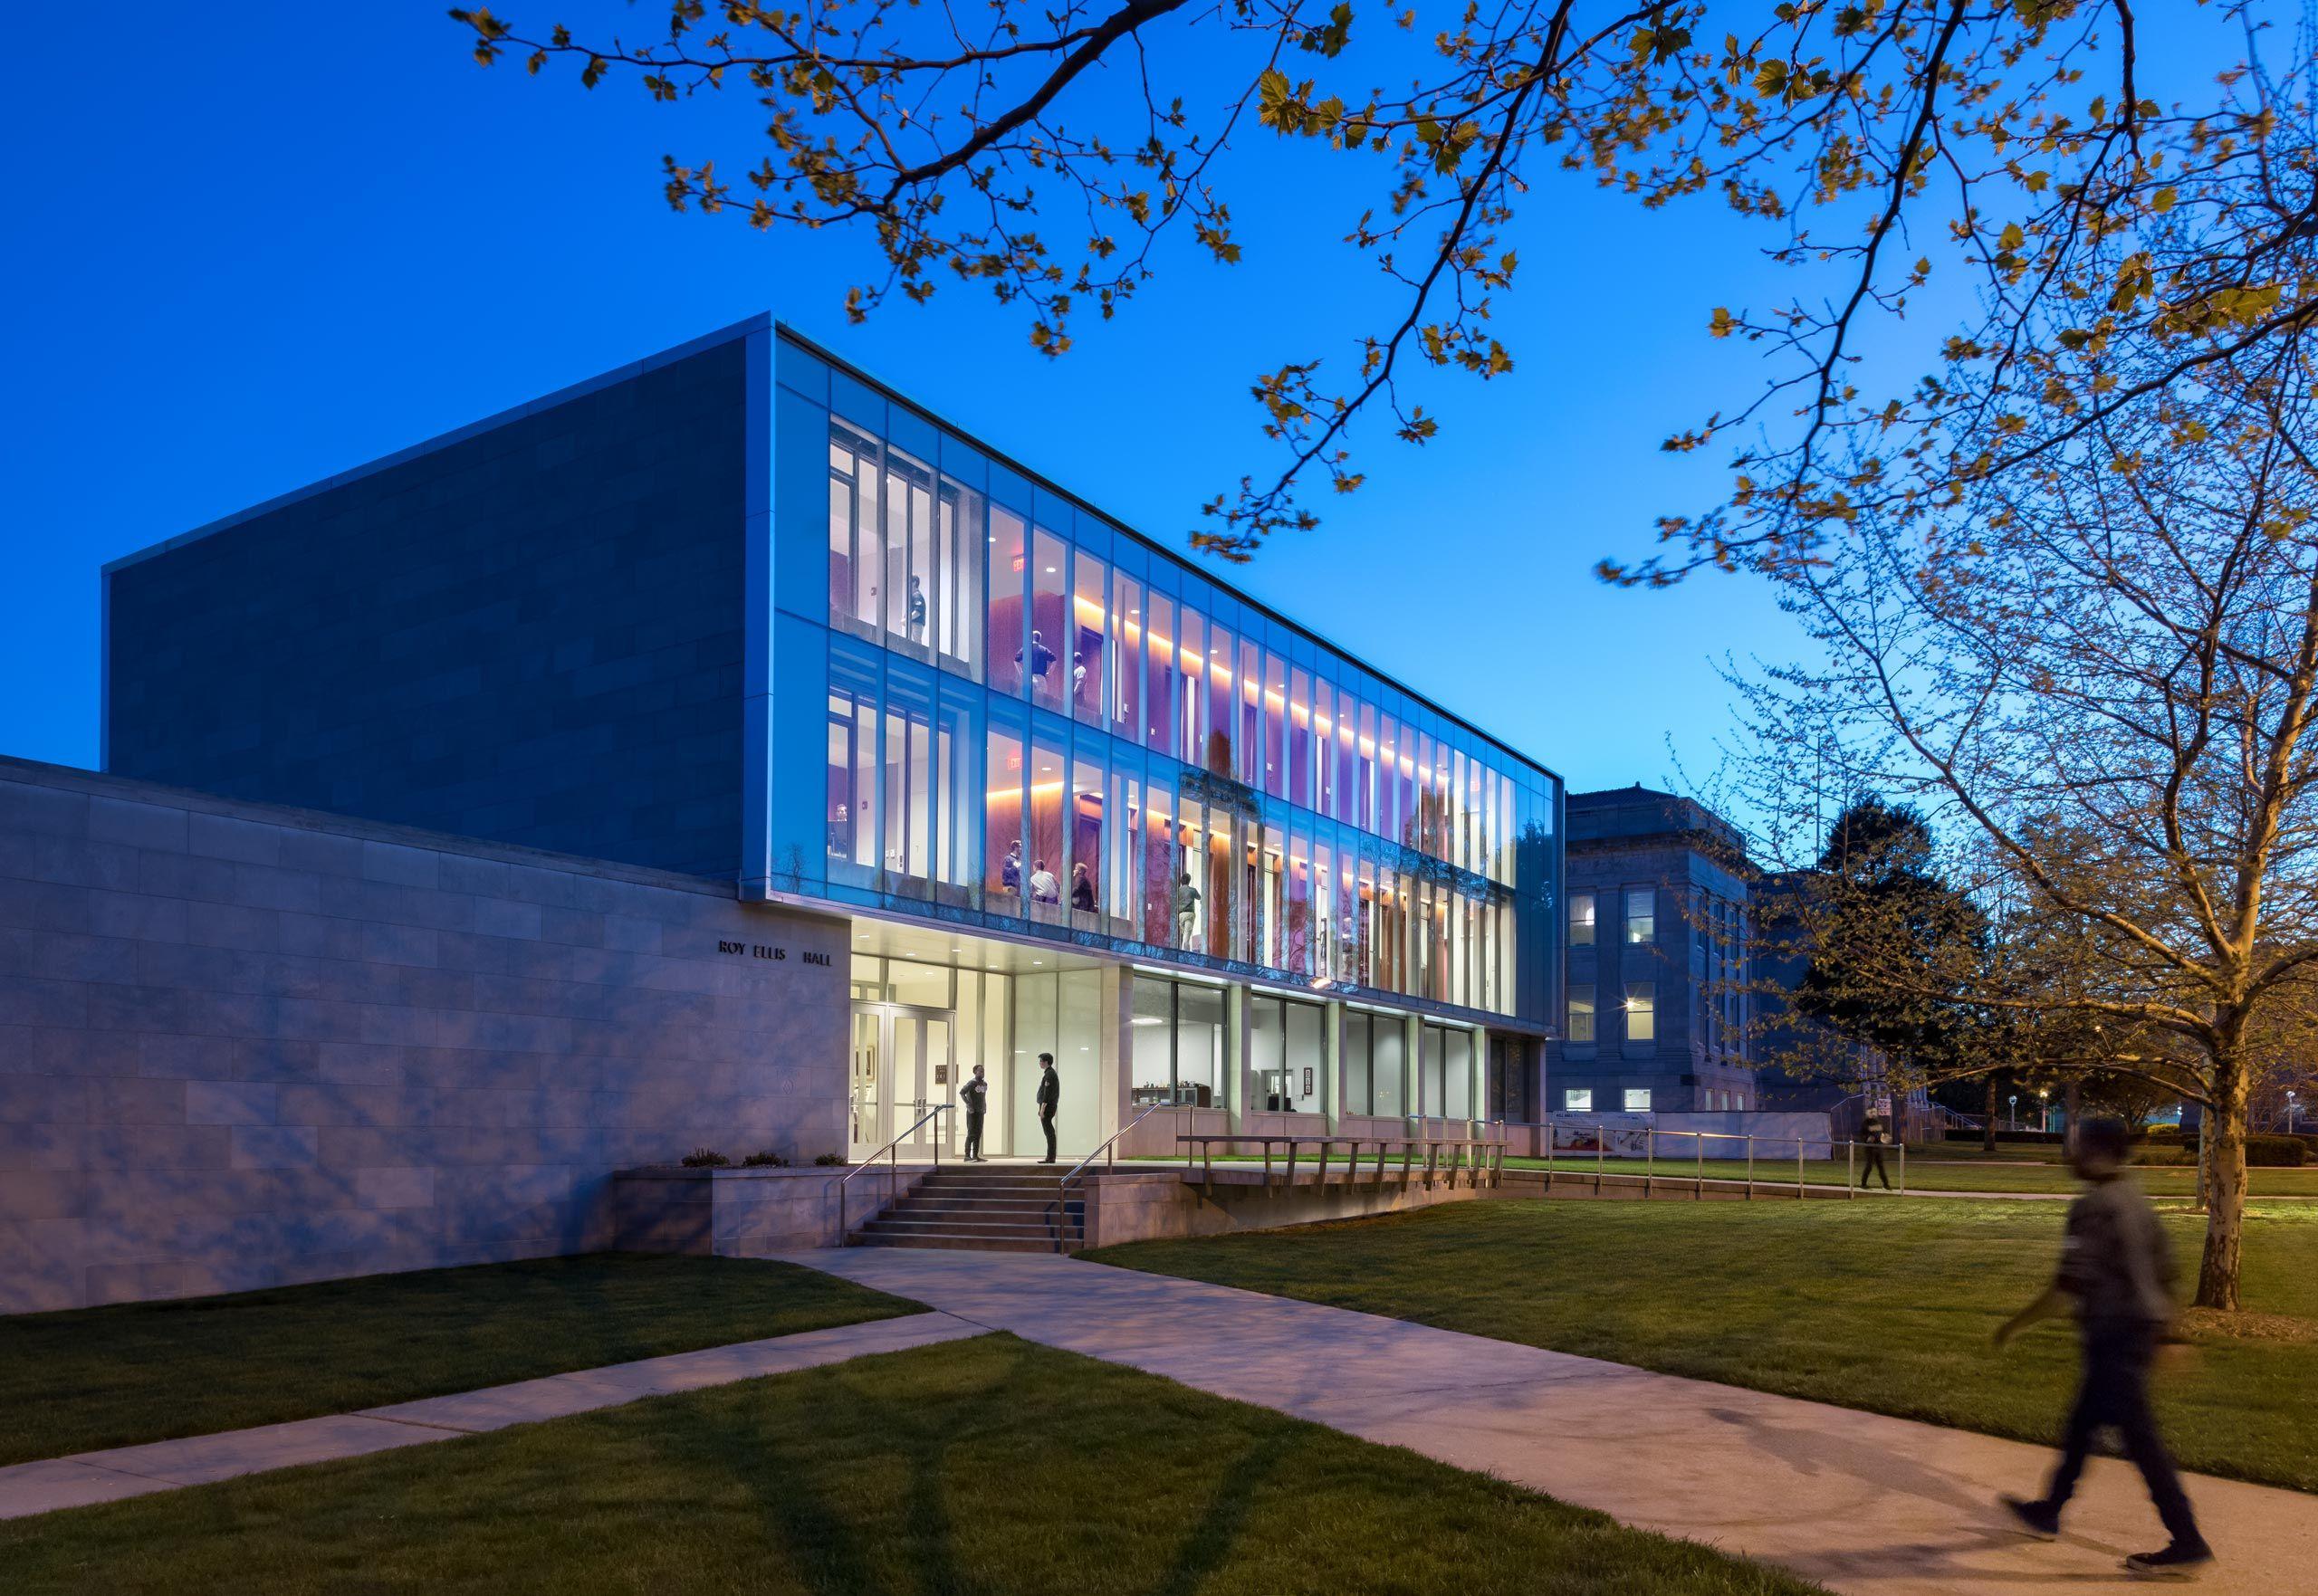 Patterhn Ives / Missouri State U. Department of Music, Ellis Hall renovation, Springfield, Missouri